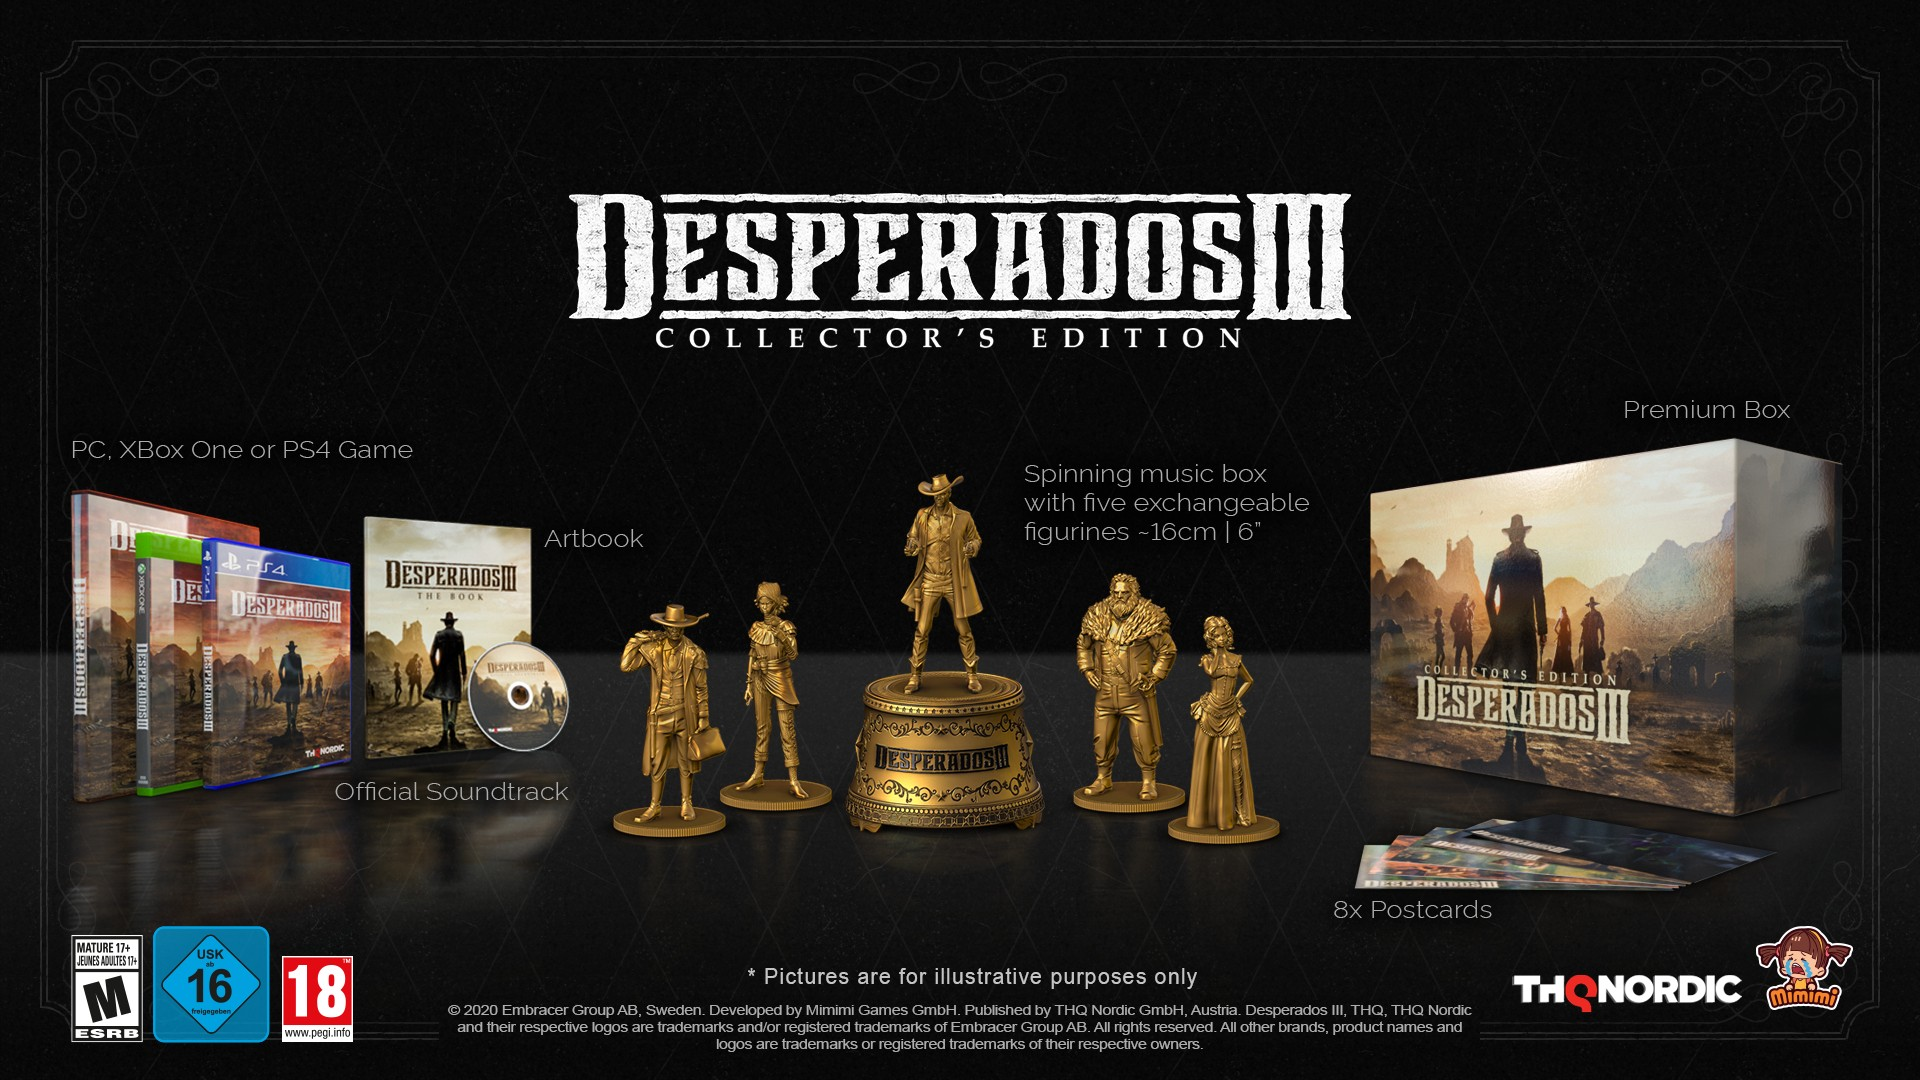 Desperados 3 brings tactical cowboys to gamers in June